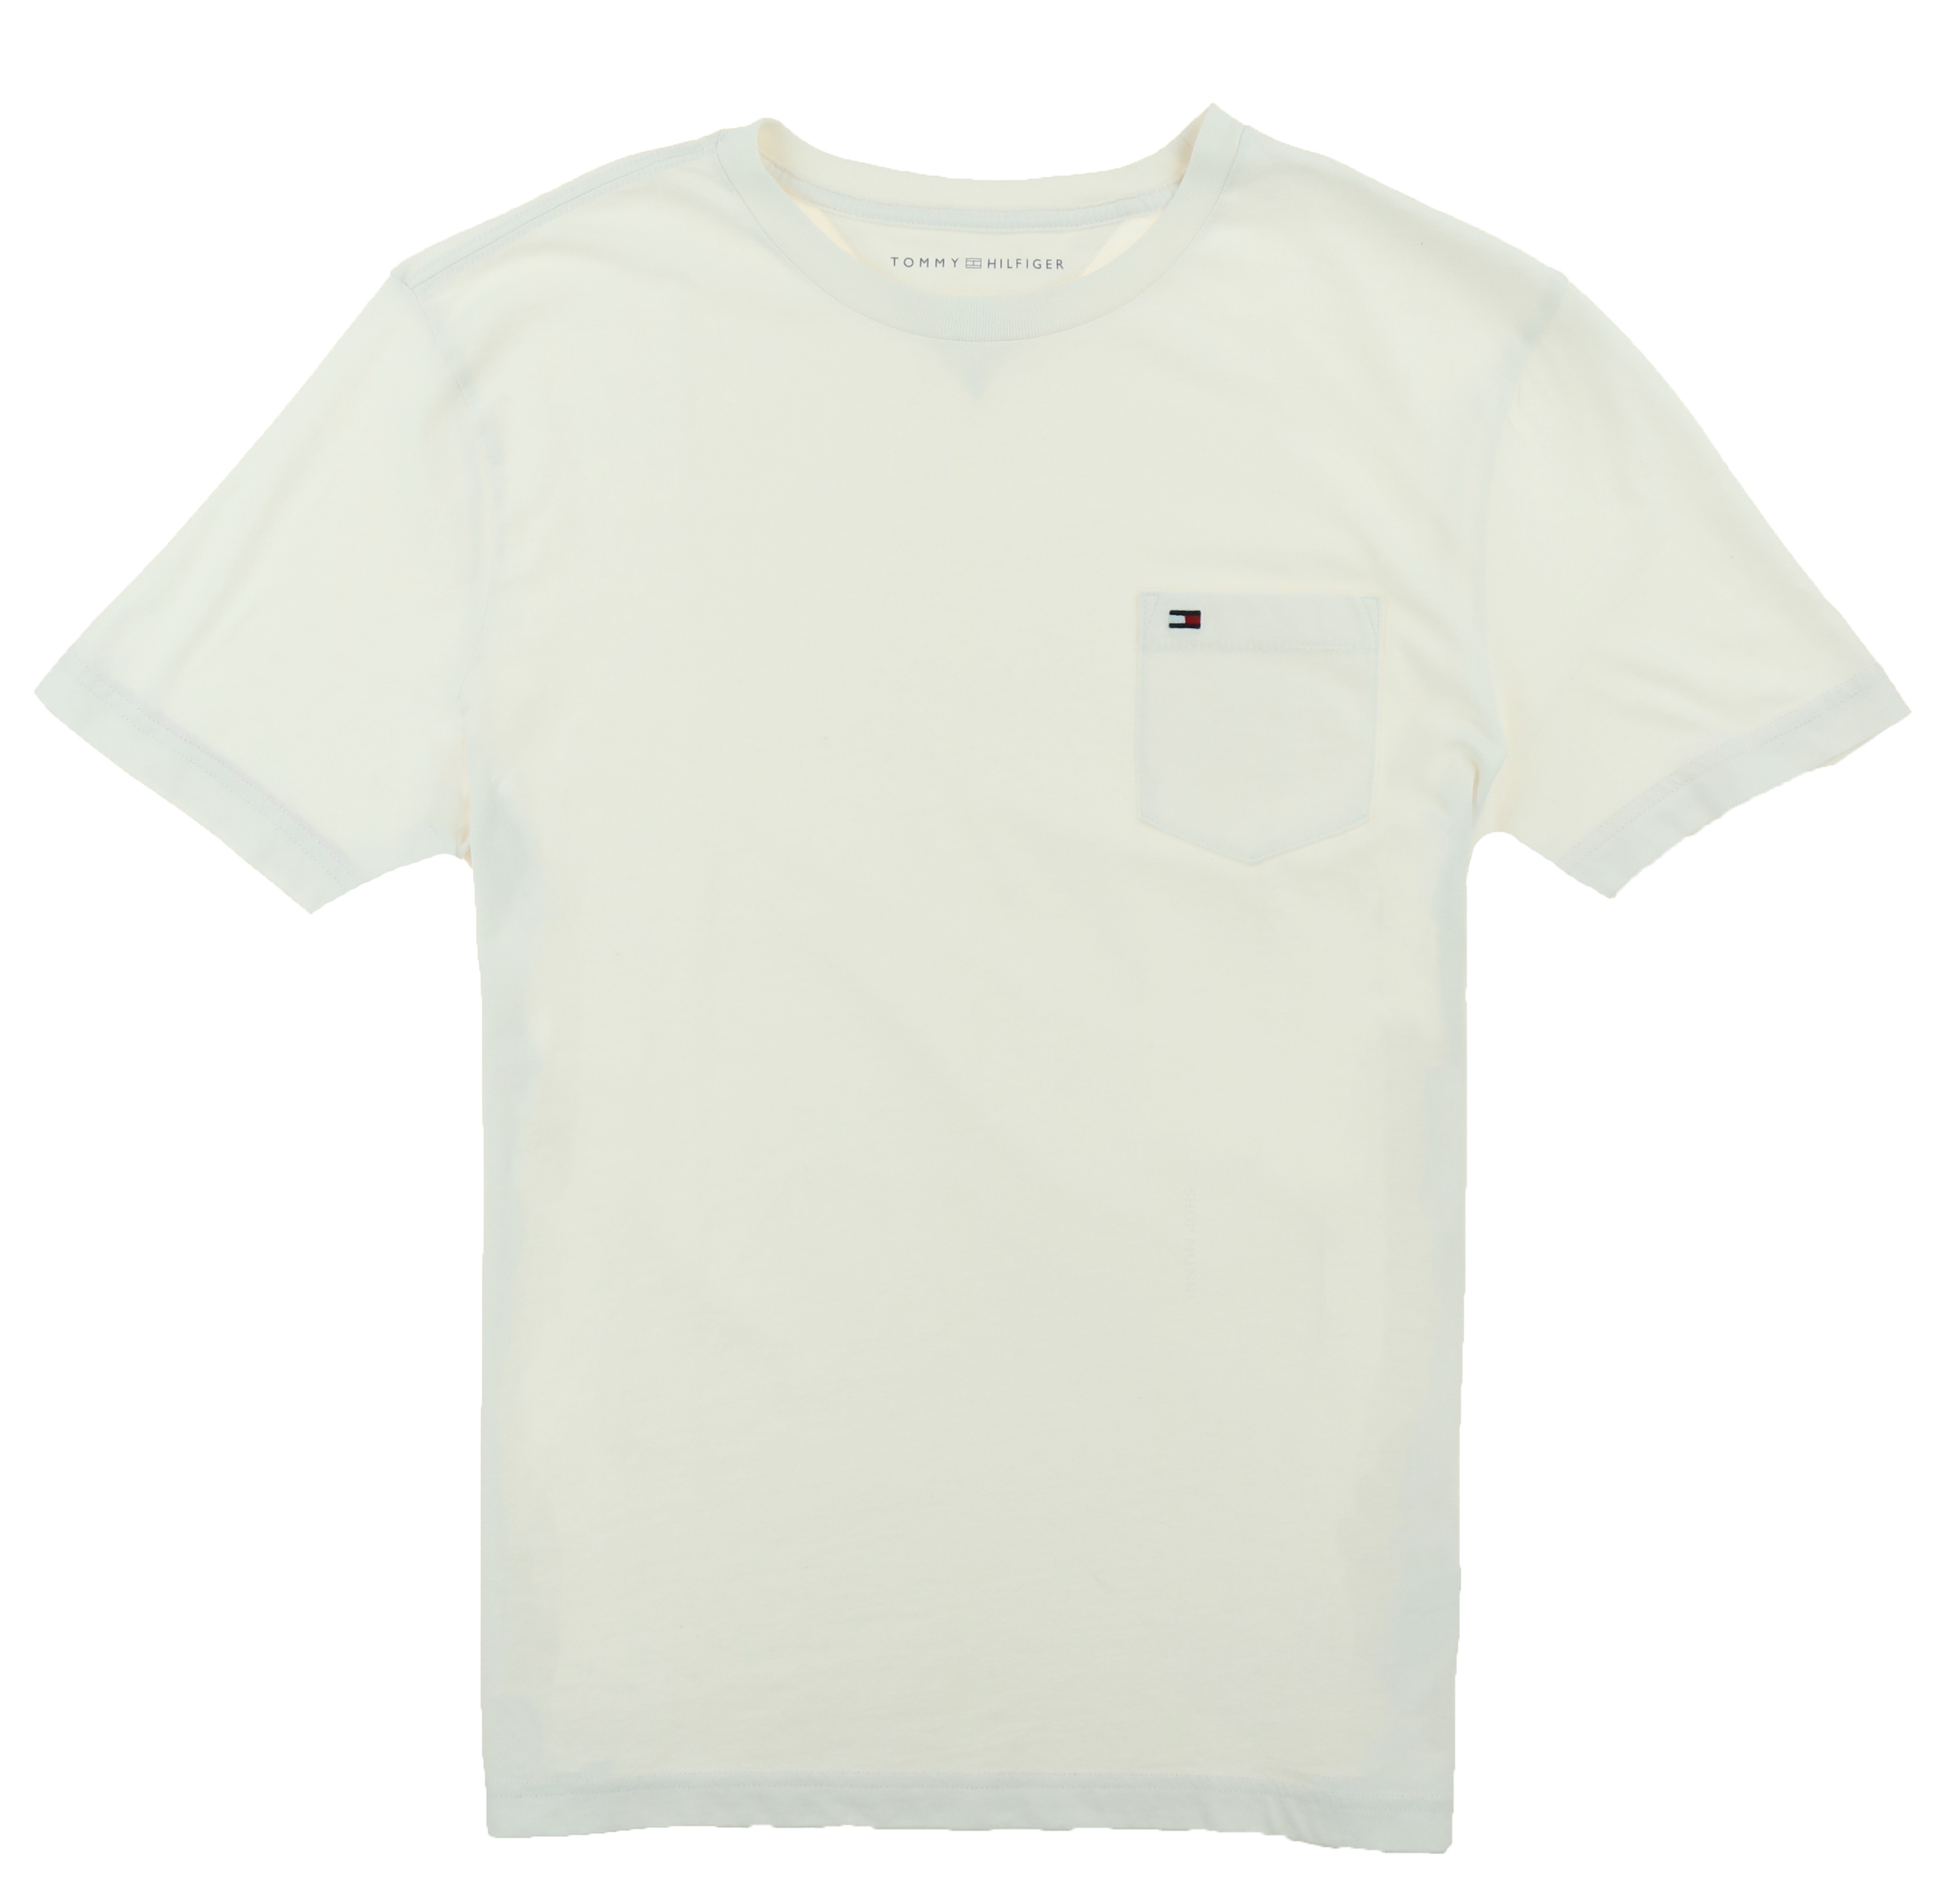 Tommy-Hilfiger-Mens-Crew-Neck-Pocket-T-shirt thumbnail 3